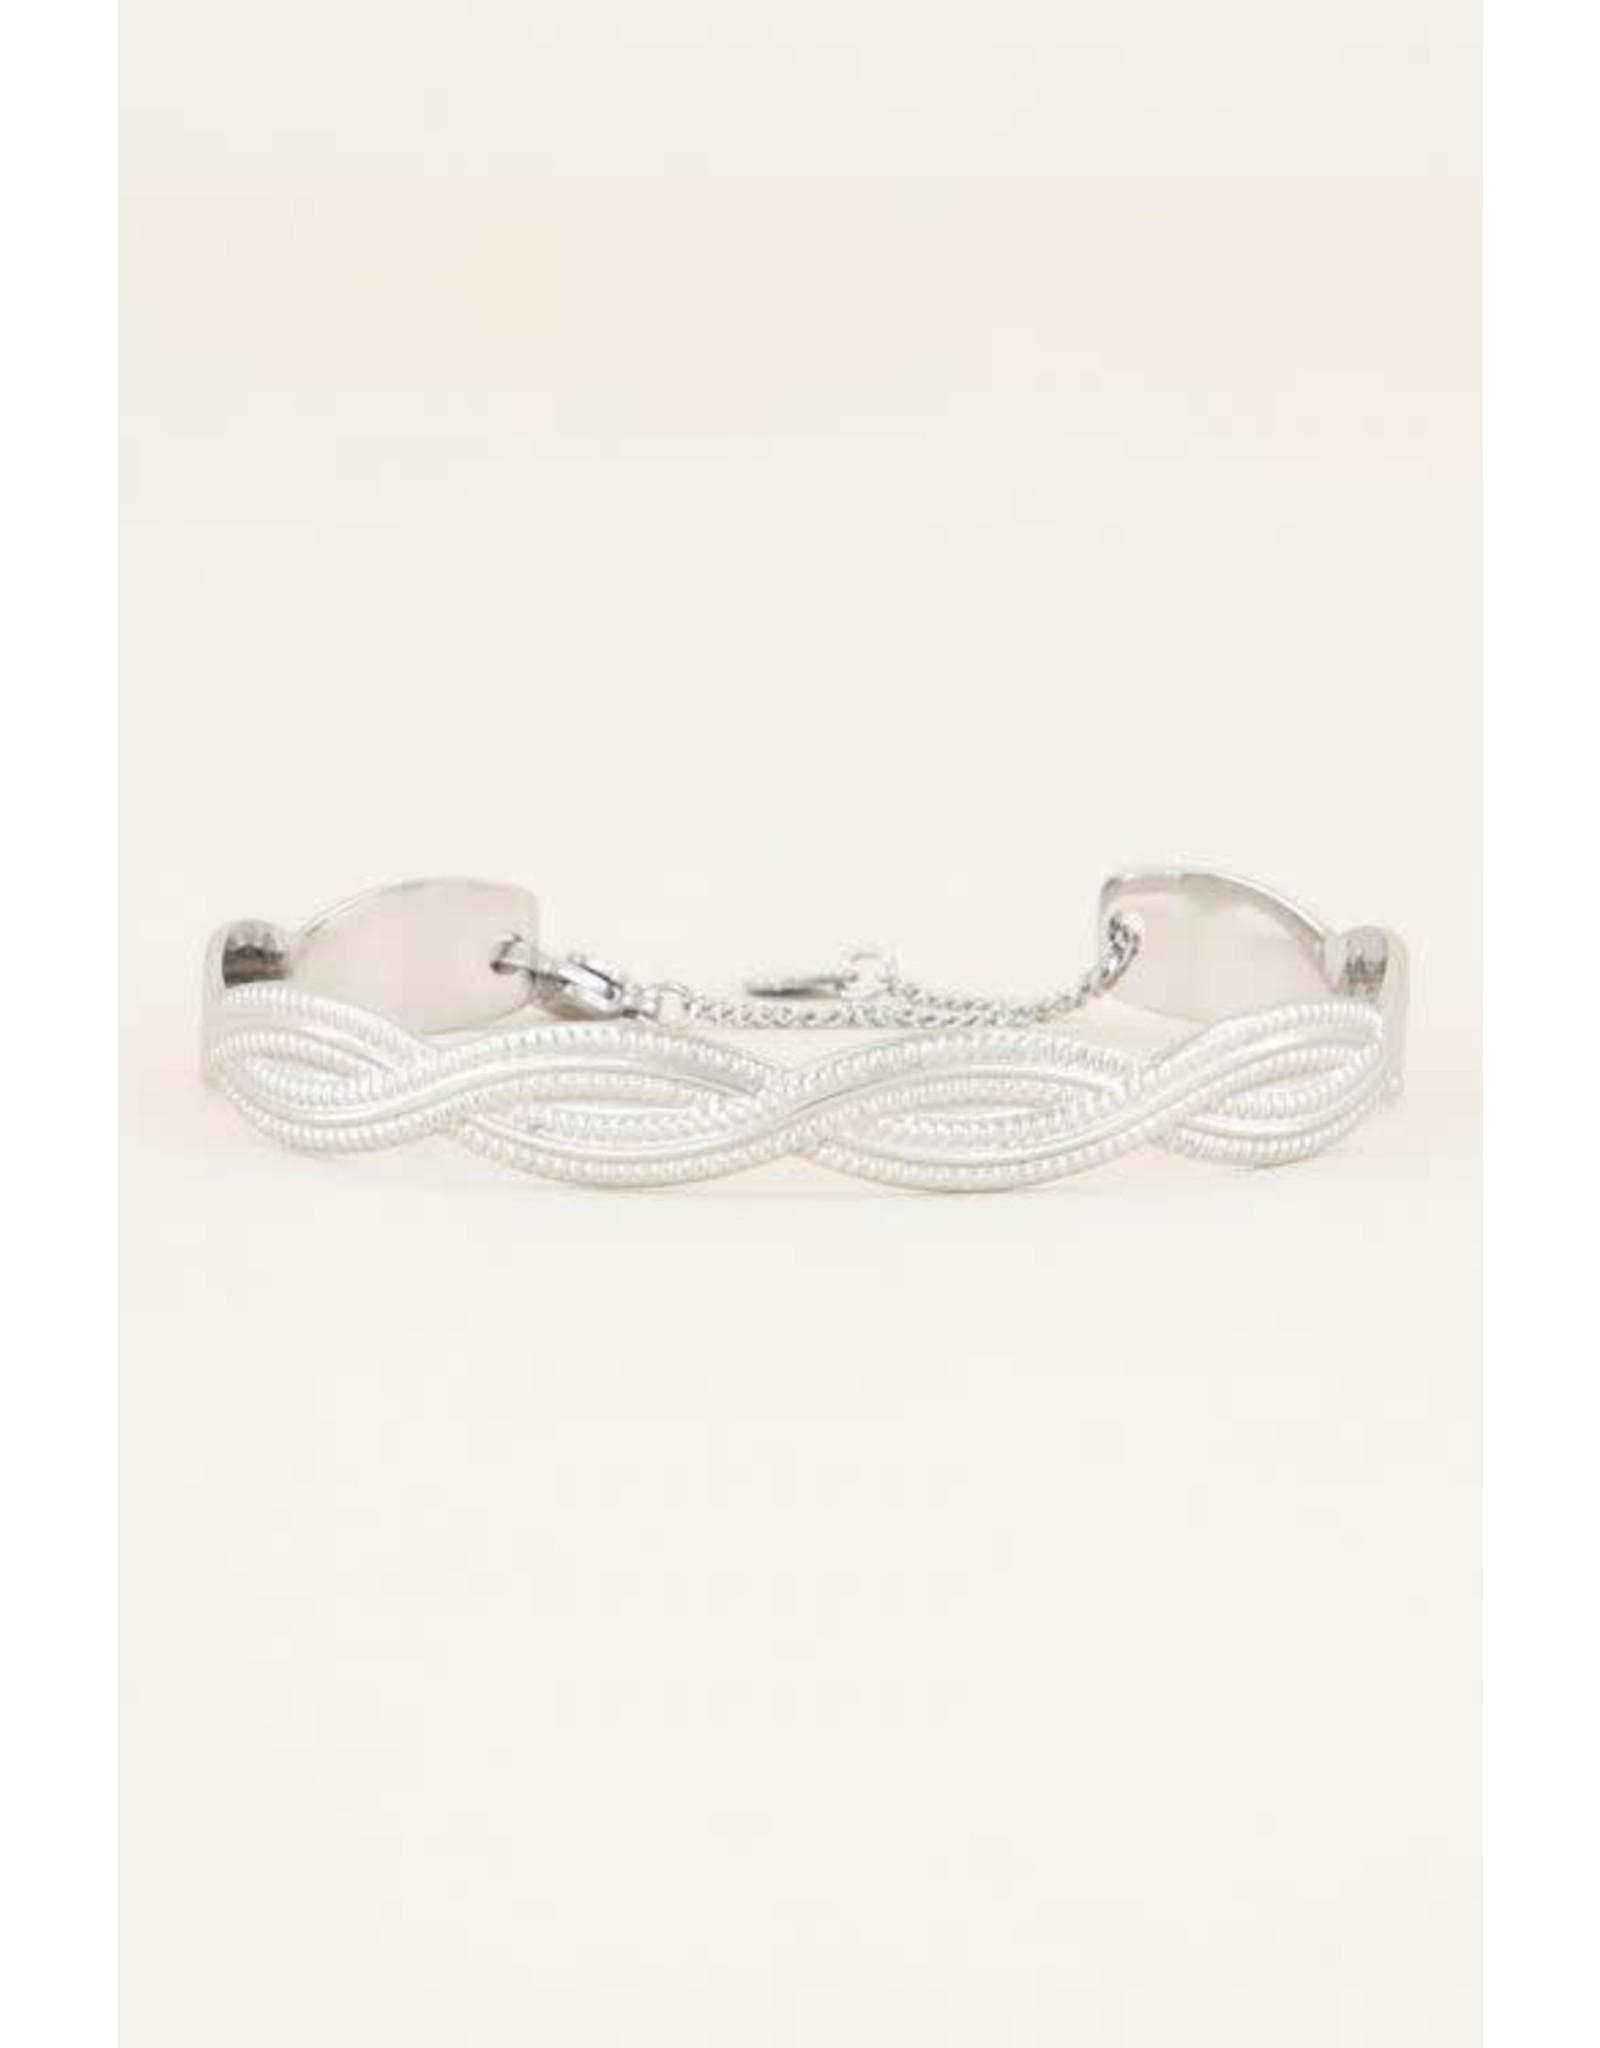 My Jewellery My Jewellery bangle